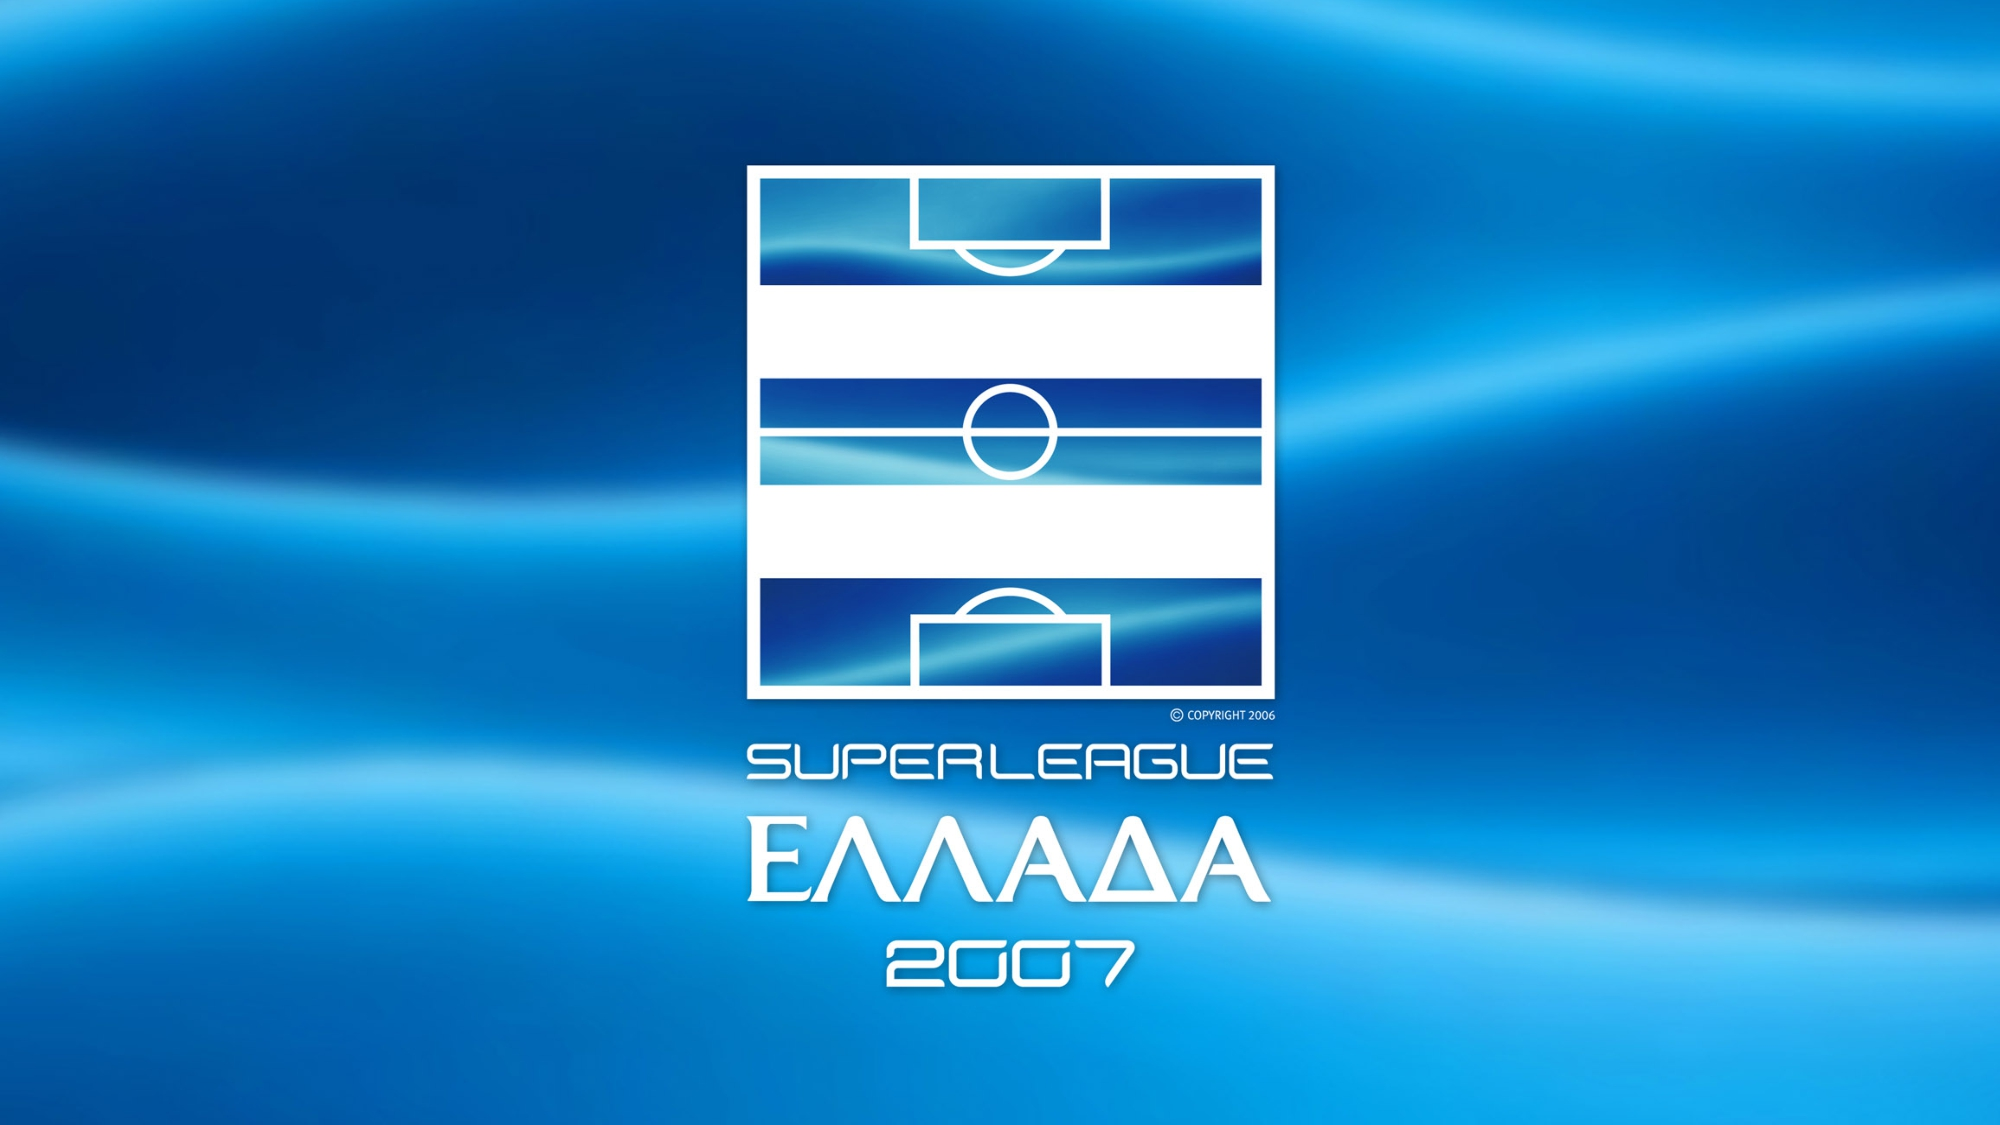 Superleague Ελλάδα 2007